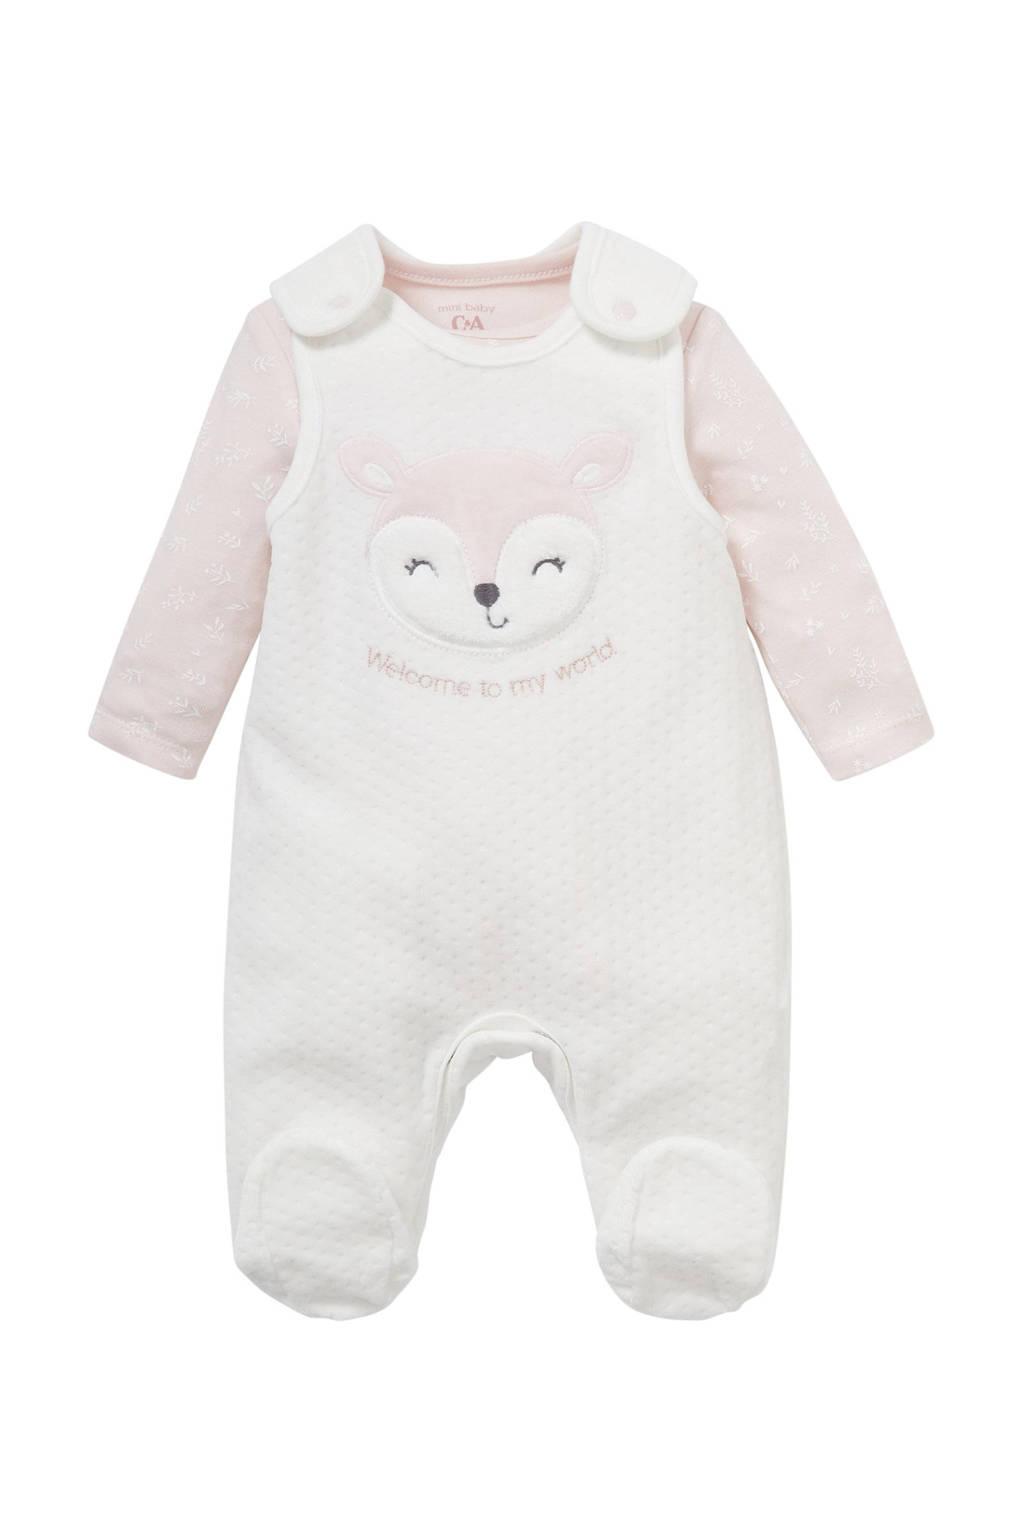 C&A Baby Newborn new born boxpak + romper wit/lichtroze, Wit/roze